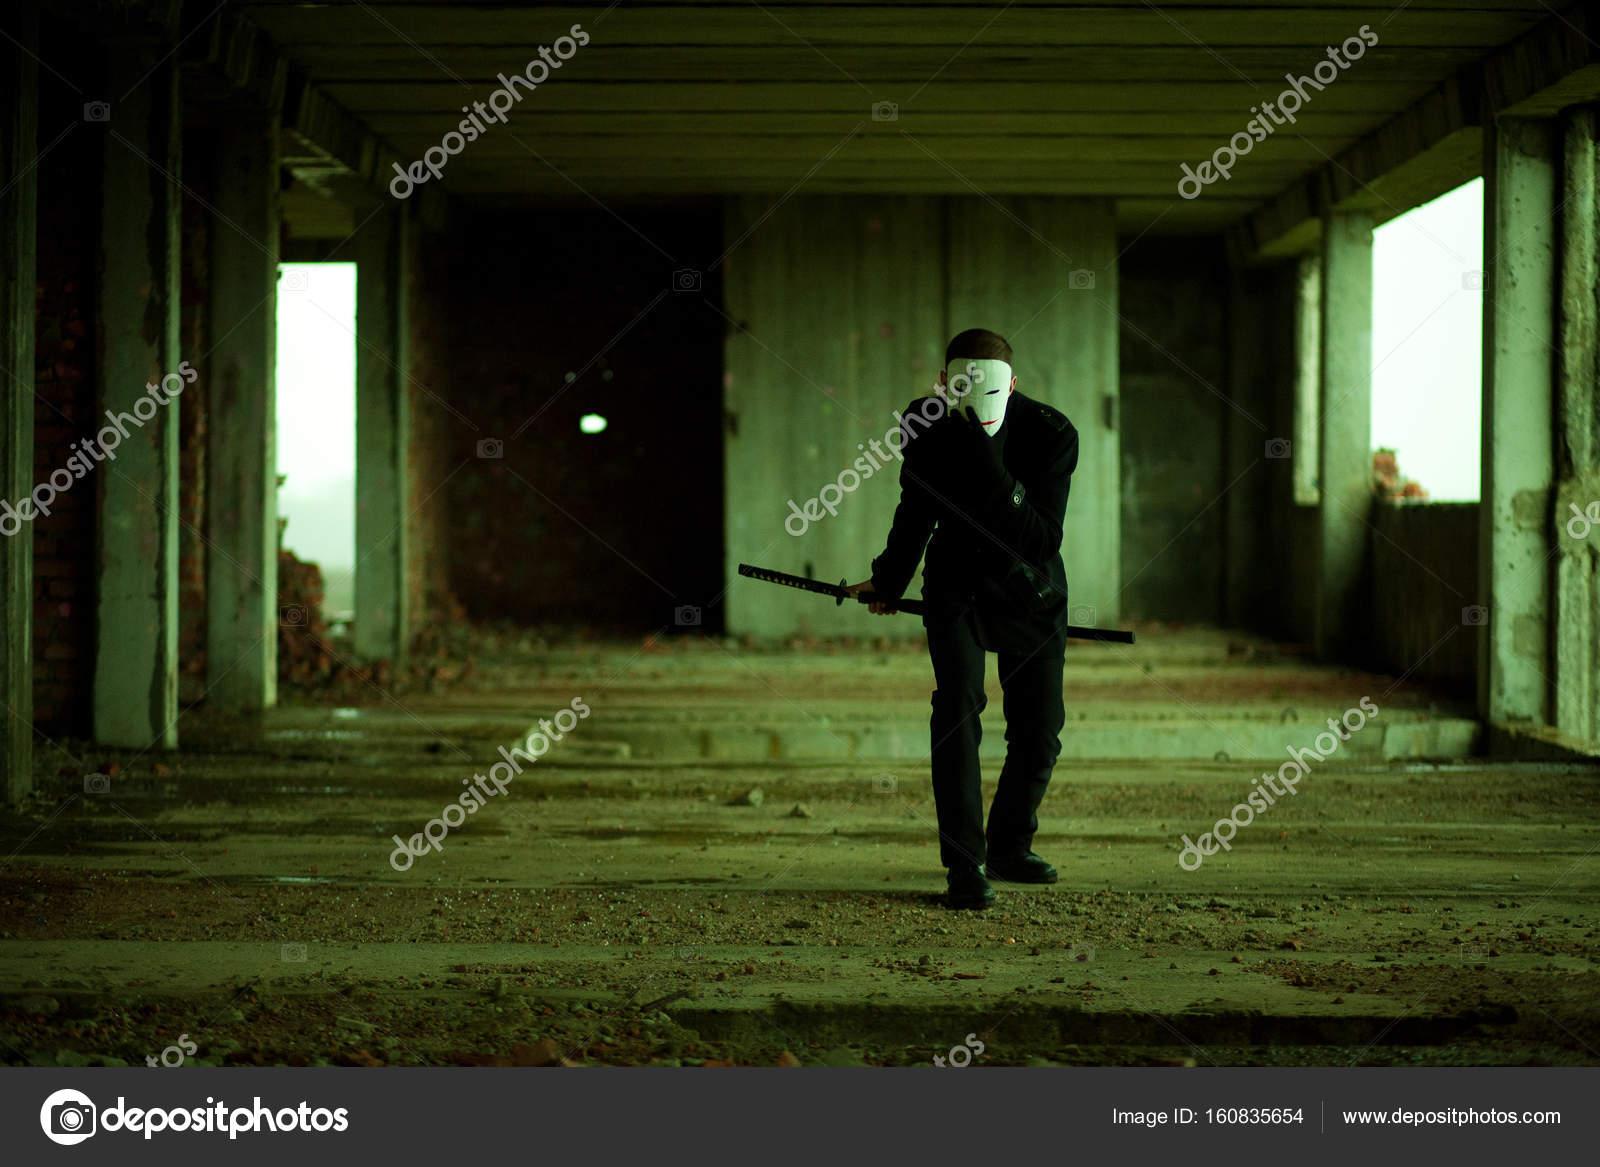 The Man In Black With A Samurai Sword Katana In An Abandoned Building Stock Photo C Laeda 160835654